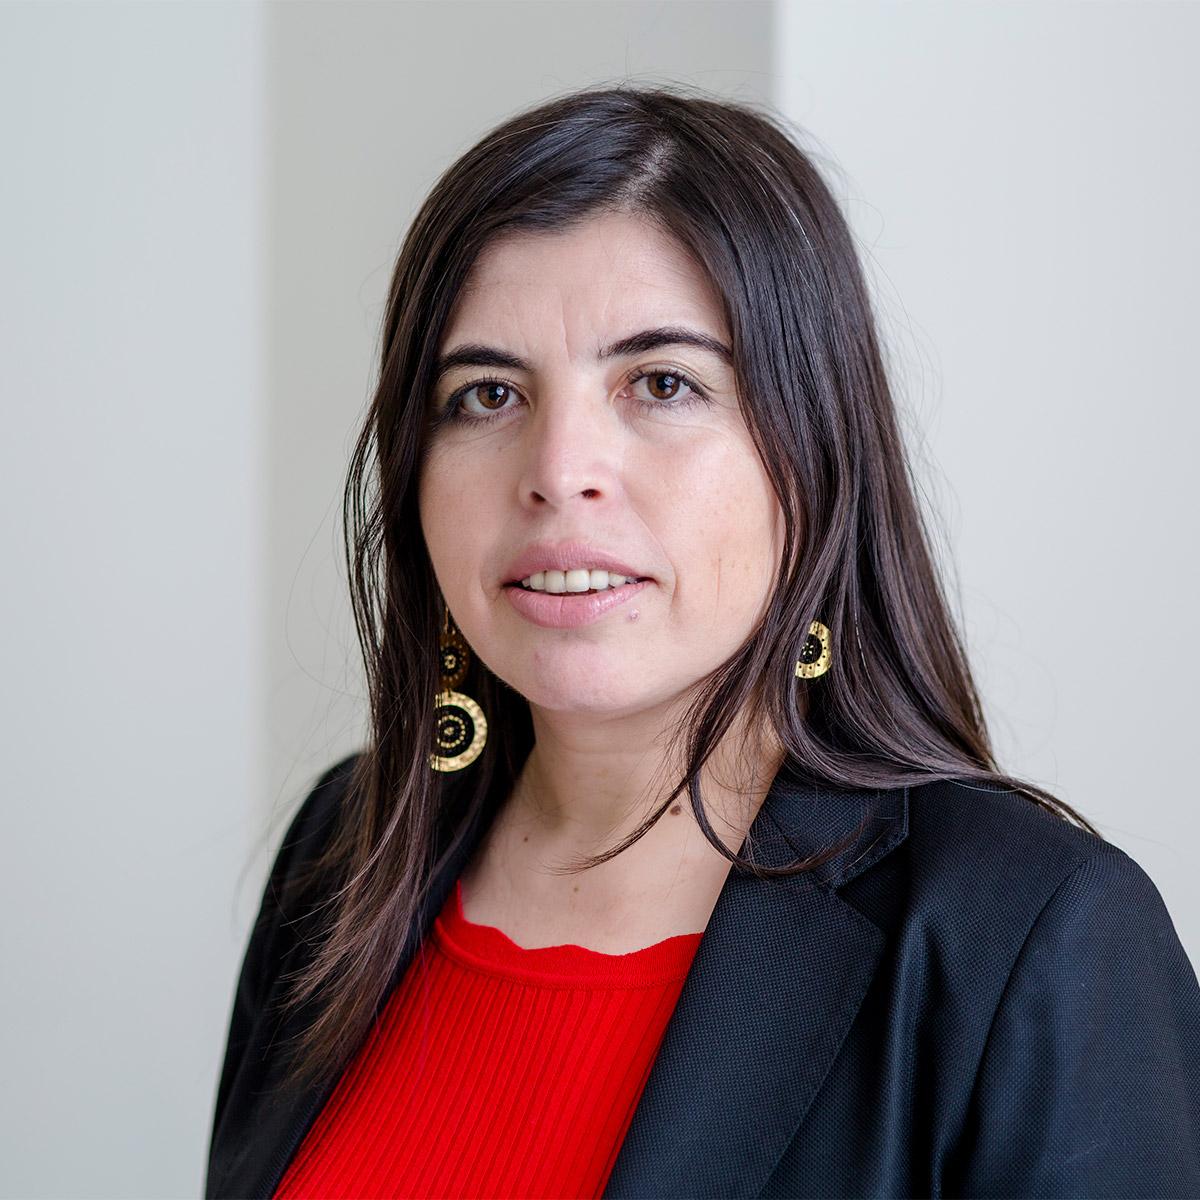 Geraldine Gonzalez Santibanez